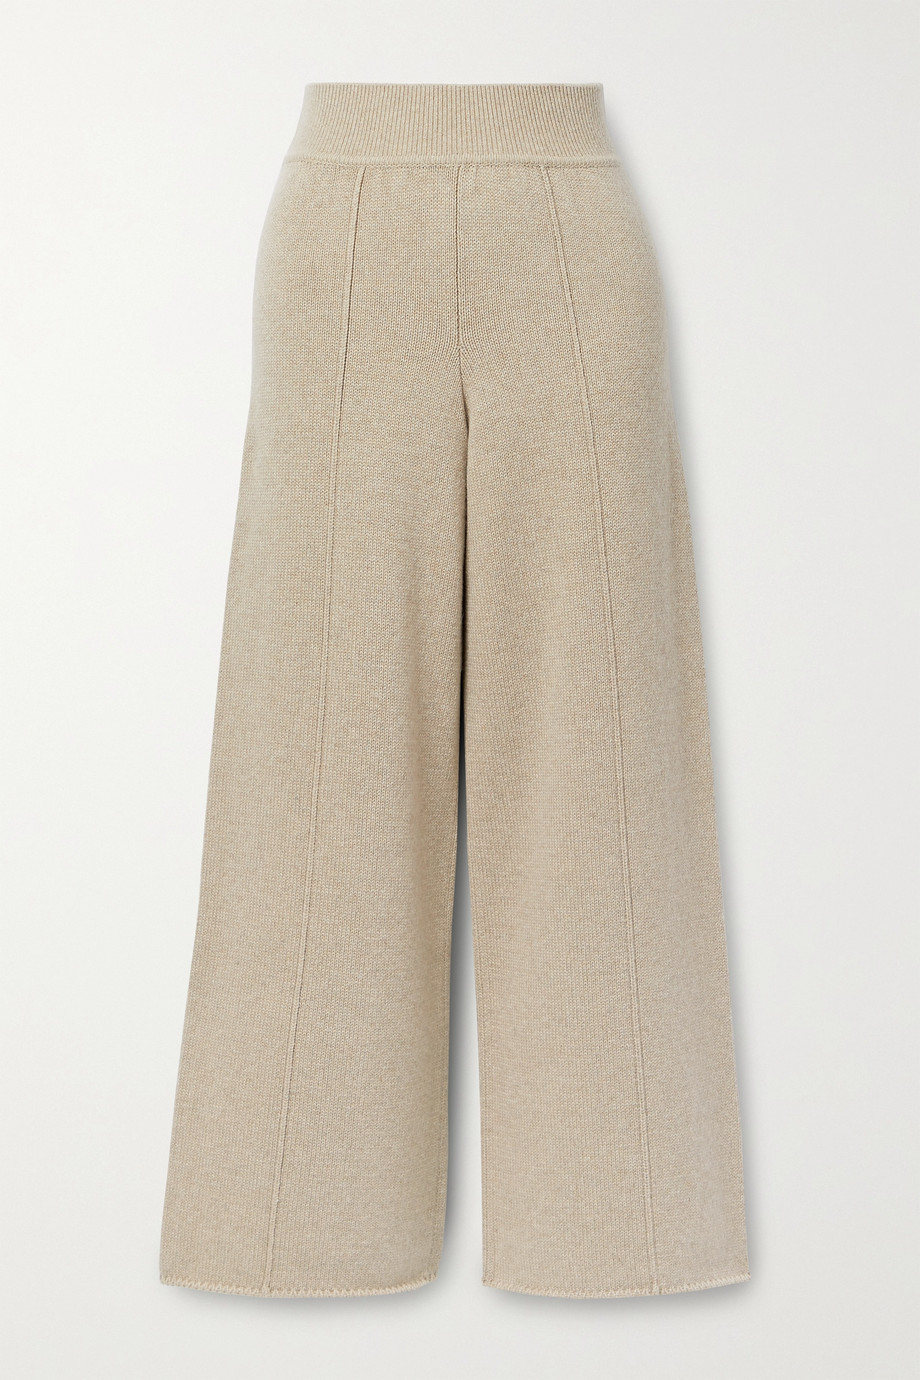 CASASOLA Pantalon large raccourci en cachemire Alba - NET SUSTAIN